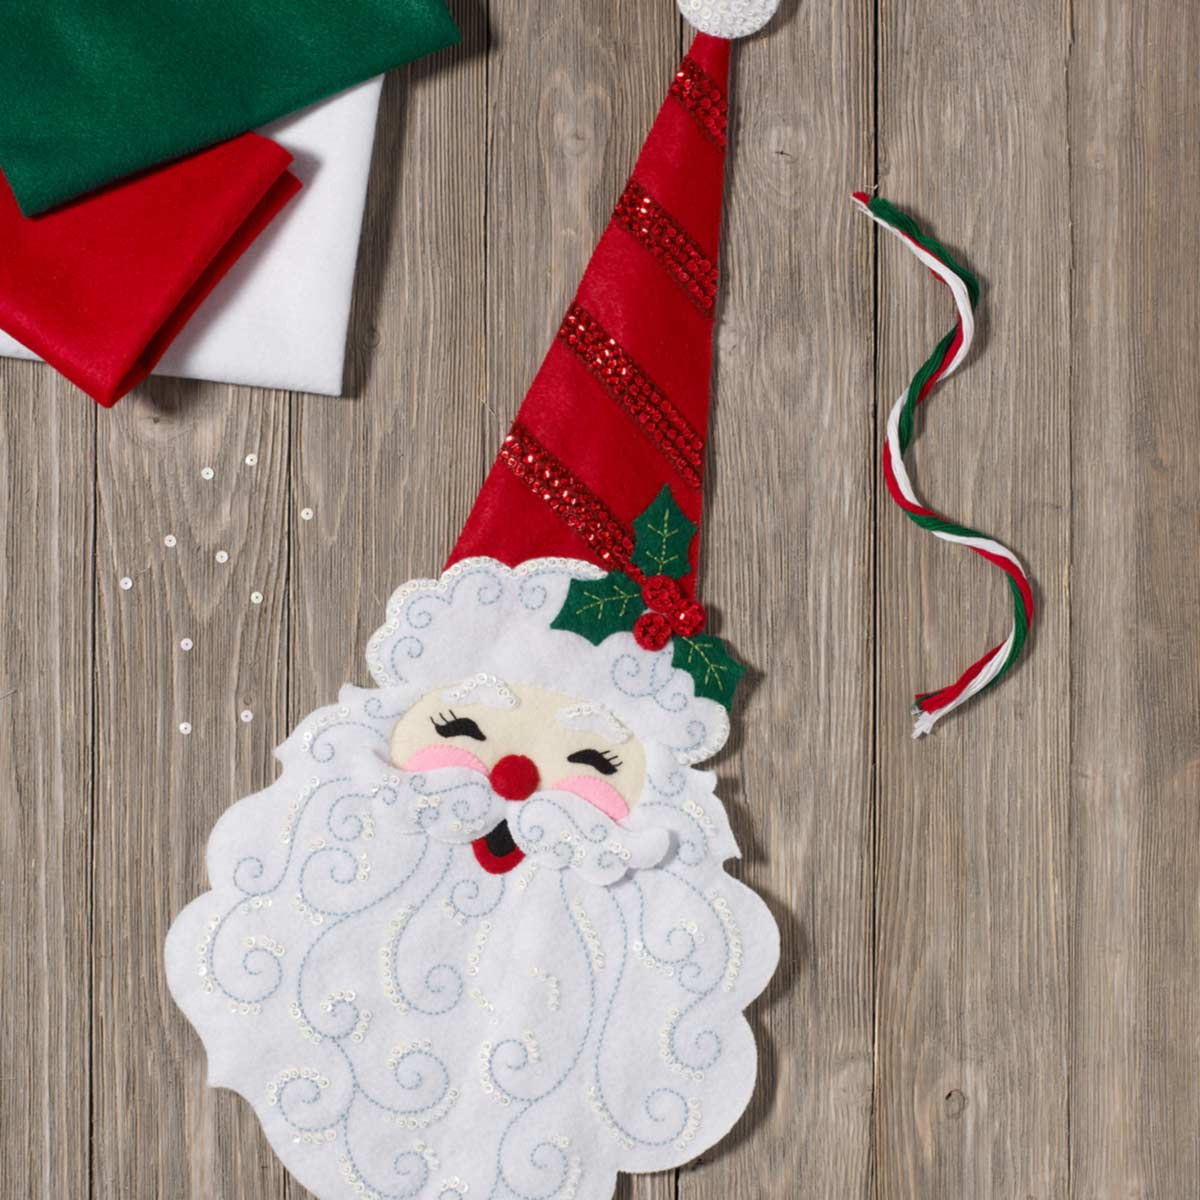 Bucilla ® Seasonal - Felt - Home Decor - Holly Jolly Santa Wall Hanging - 86834